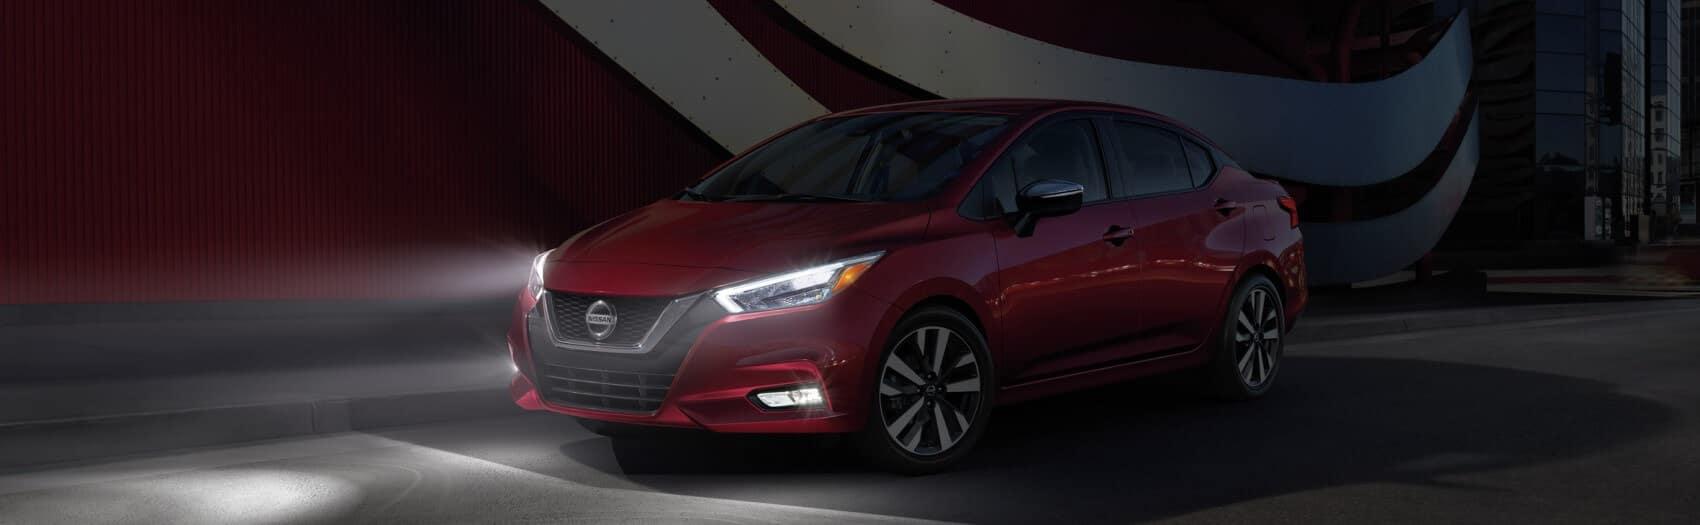 Nissan Versa for Sale near Daphne AL